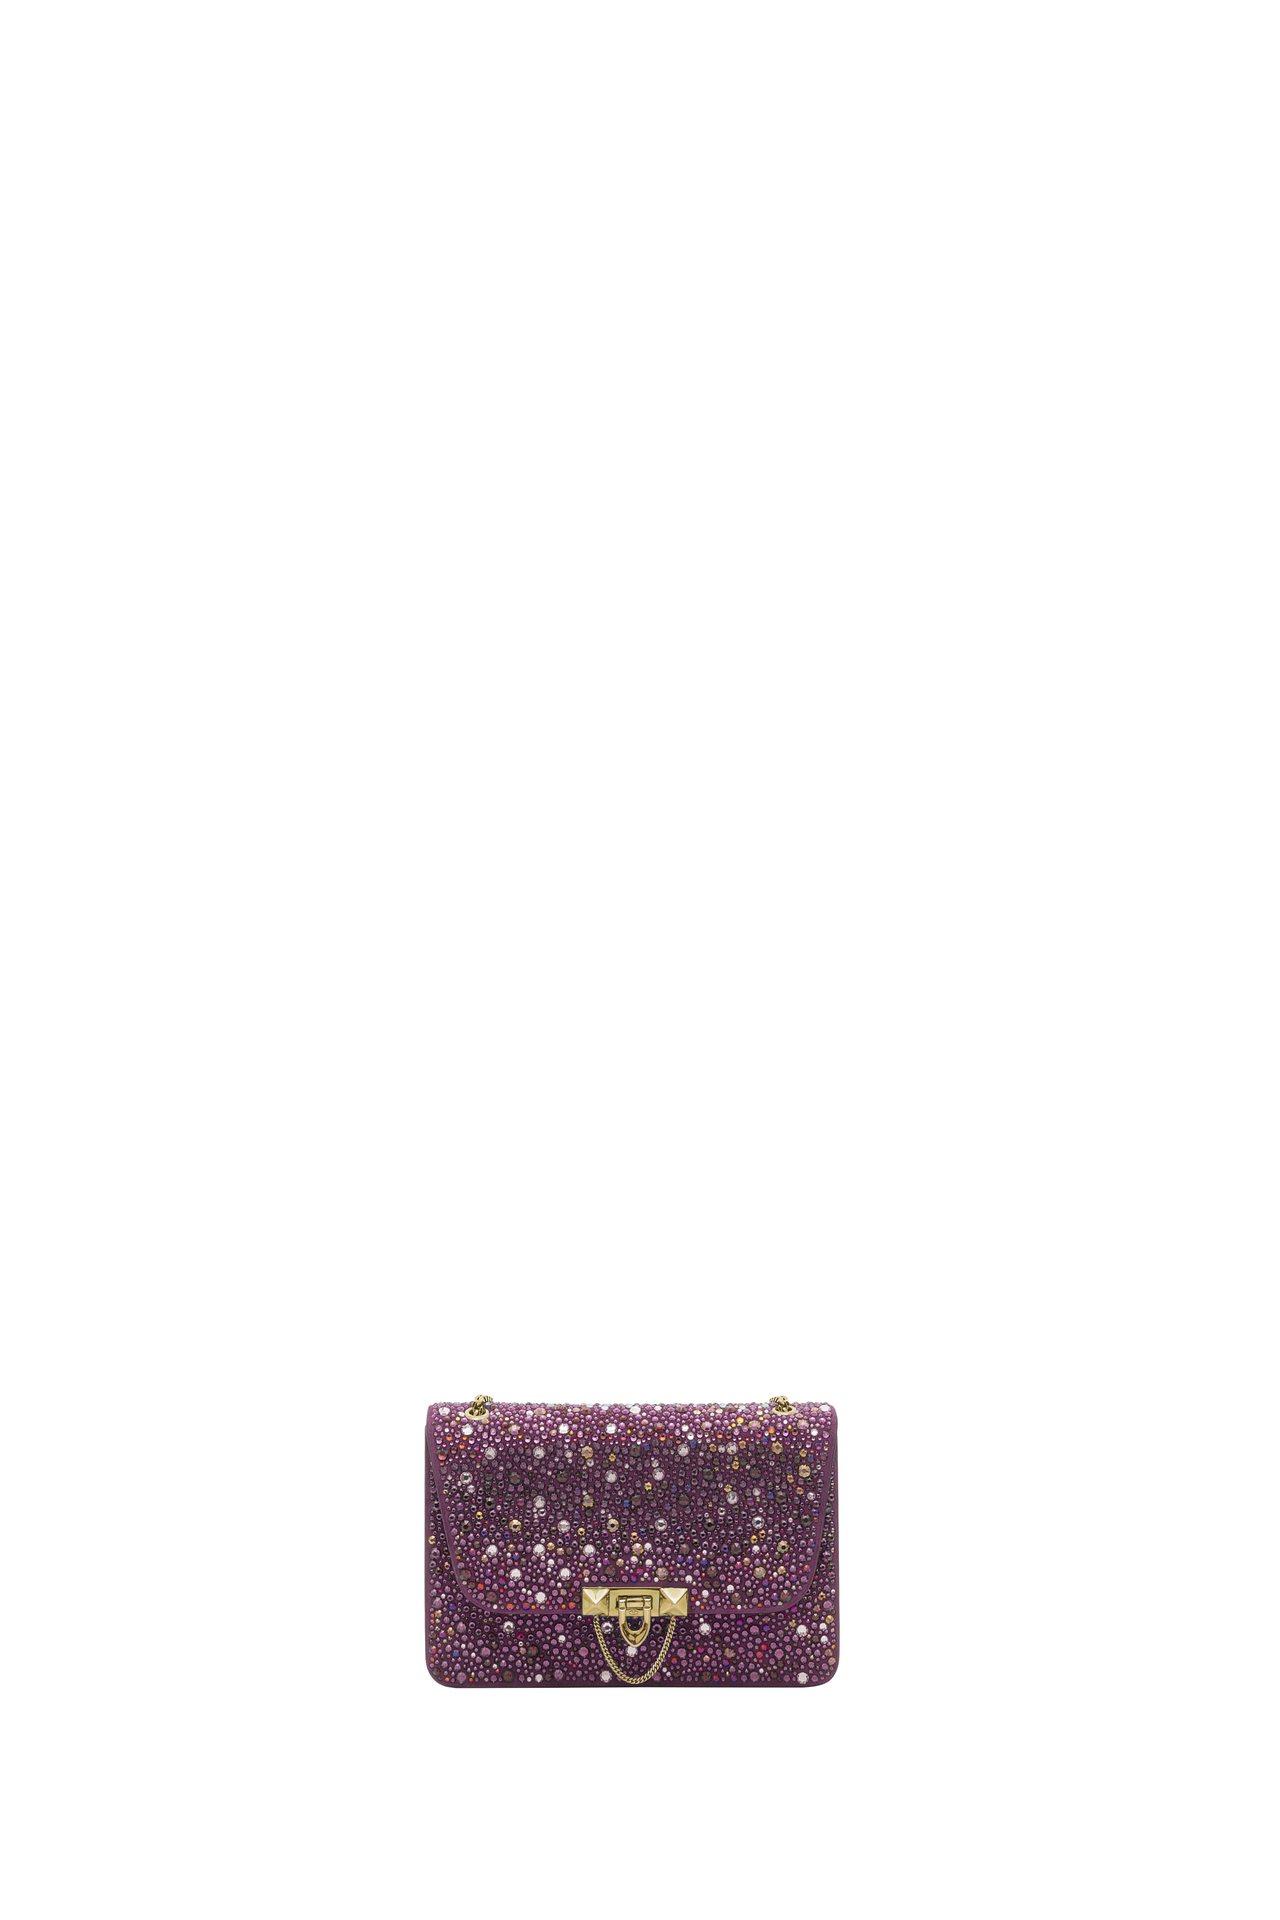 Valentino紫色水晶裝飾包,價格店洽。圖/Valentino提供